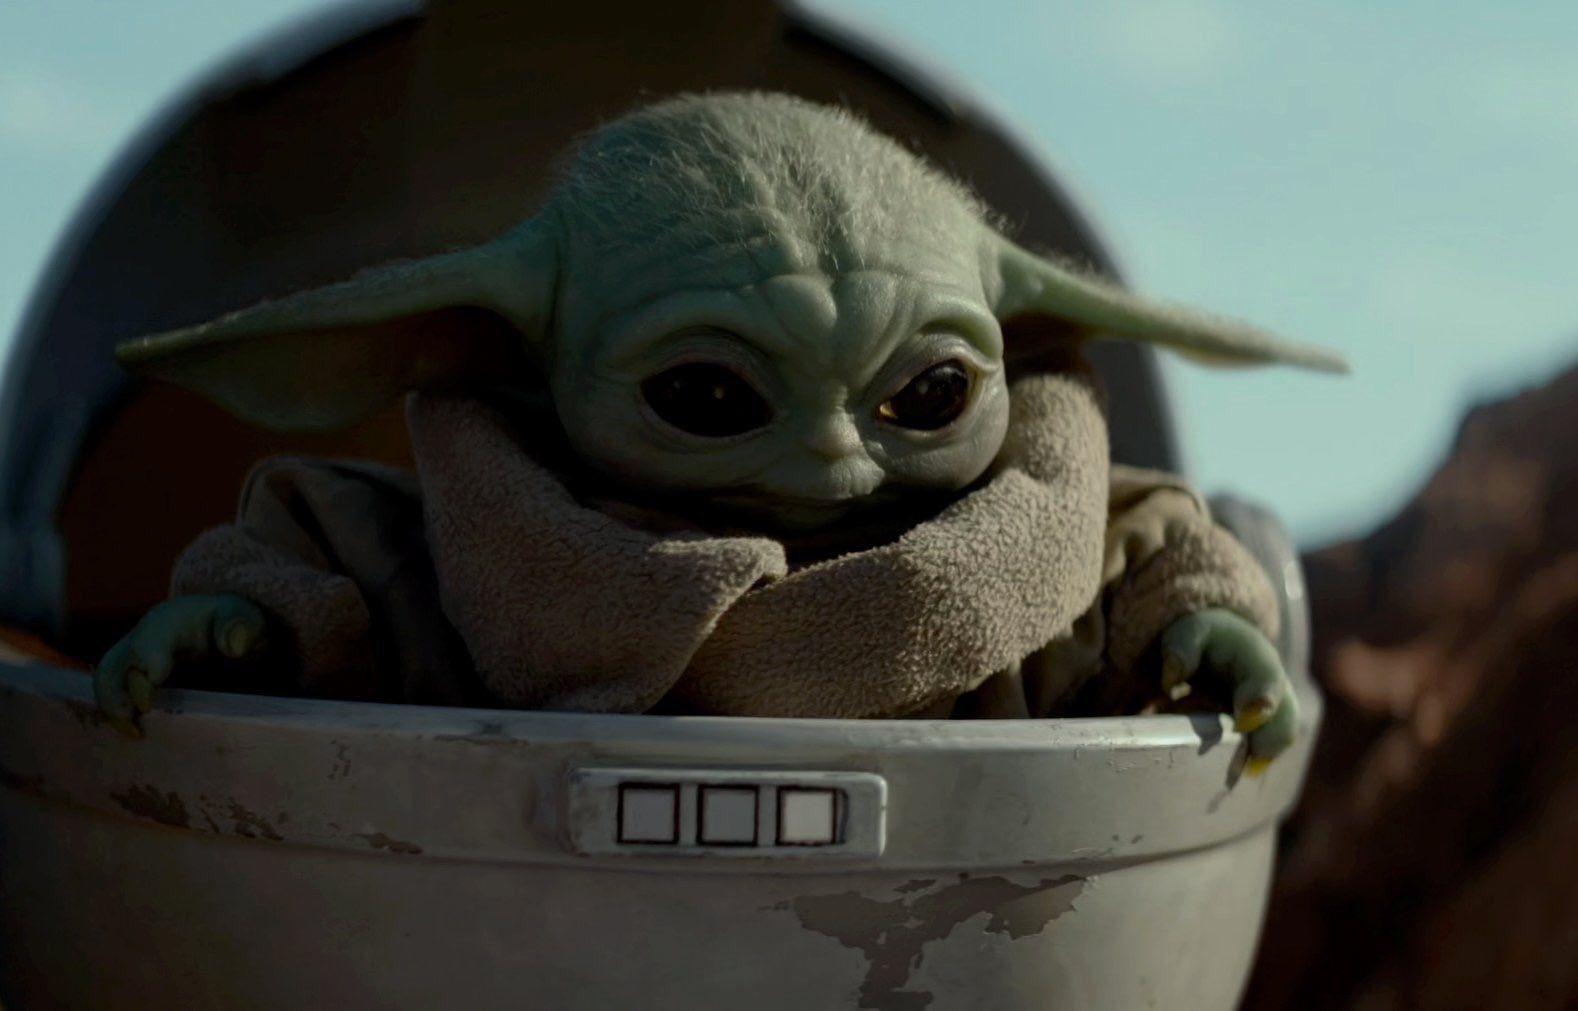 17 Beautiful Baby Yoda Wallpapers Yoda Wallpaper Star Wars Pictures Yoda Images